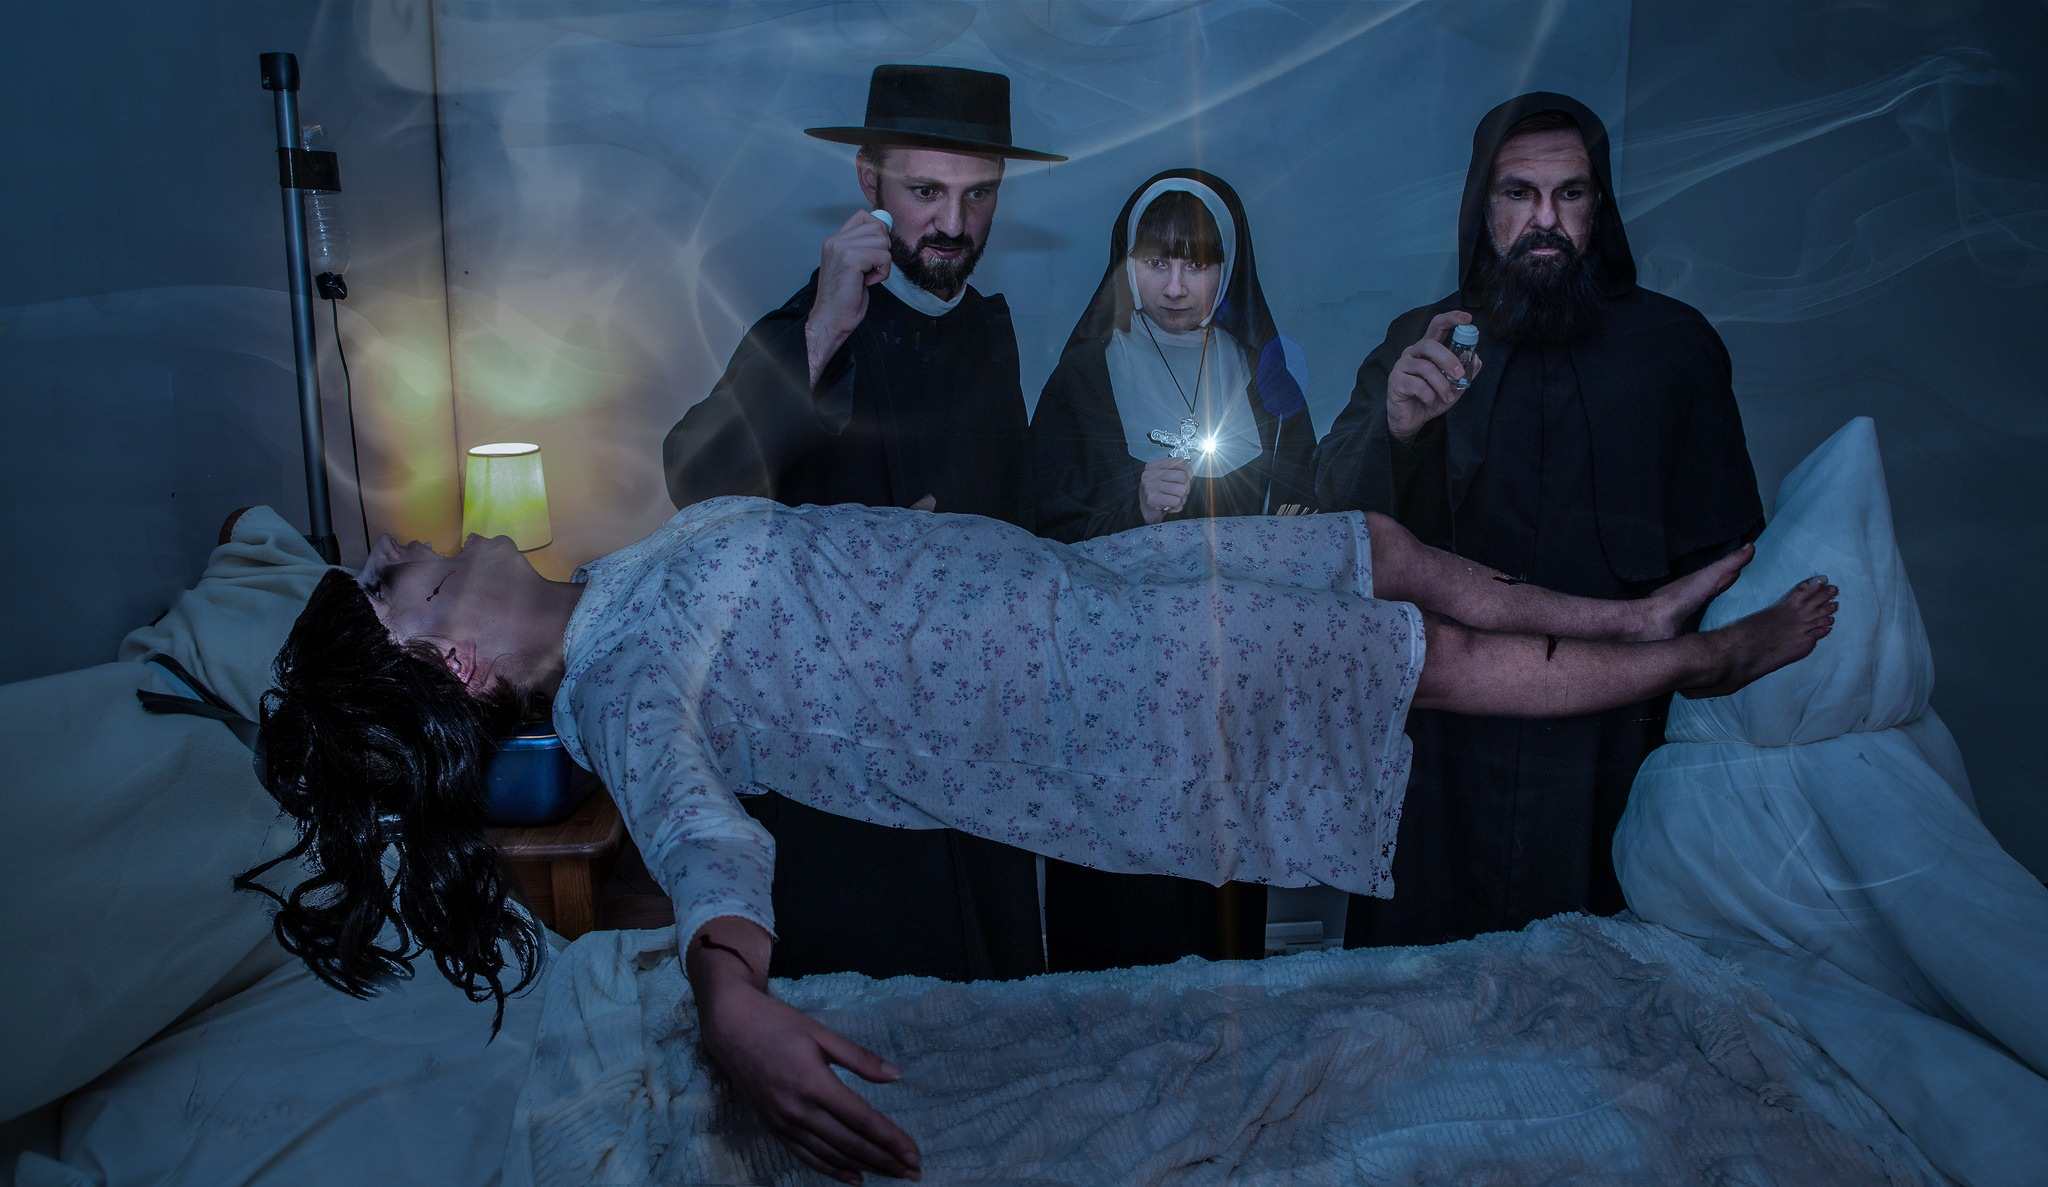 The Exorcist by Photographer Gino Cinganelli